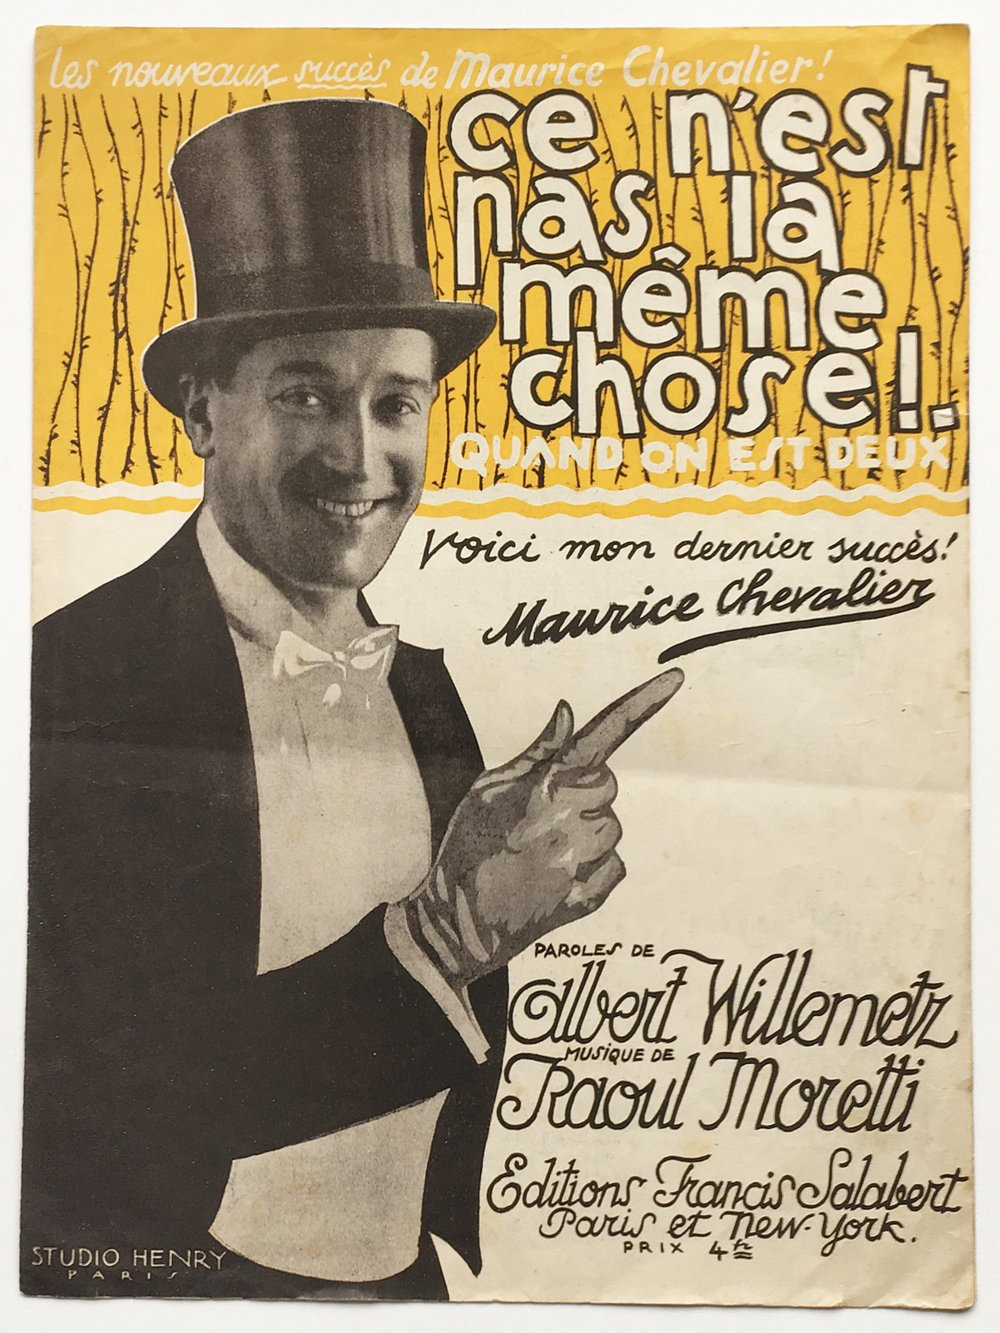 Raoul.circus.tophut.postcard.03.jpg